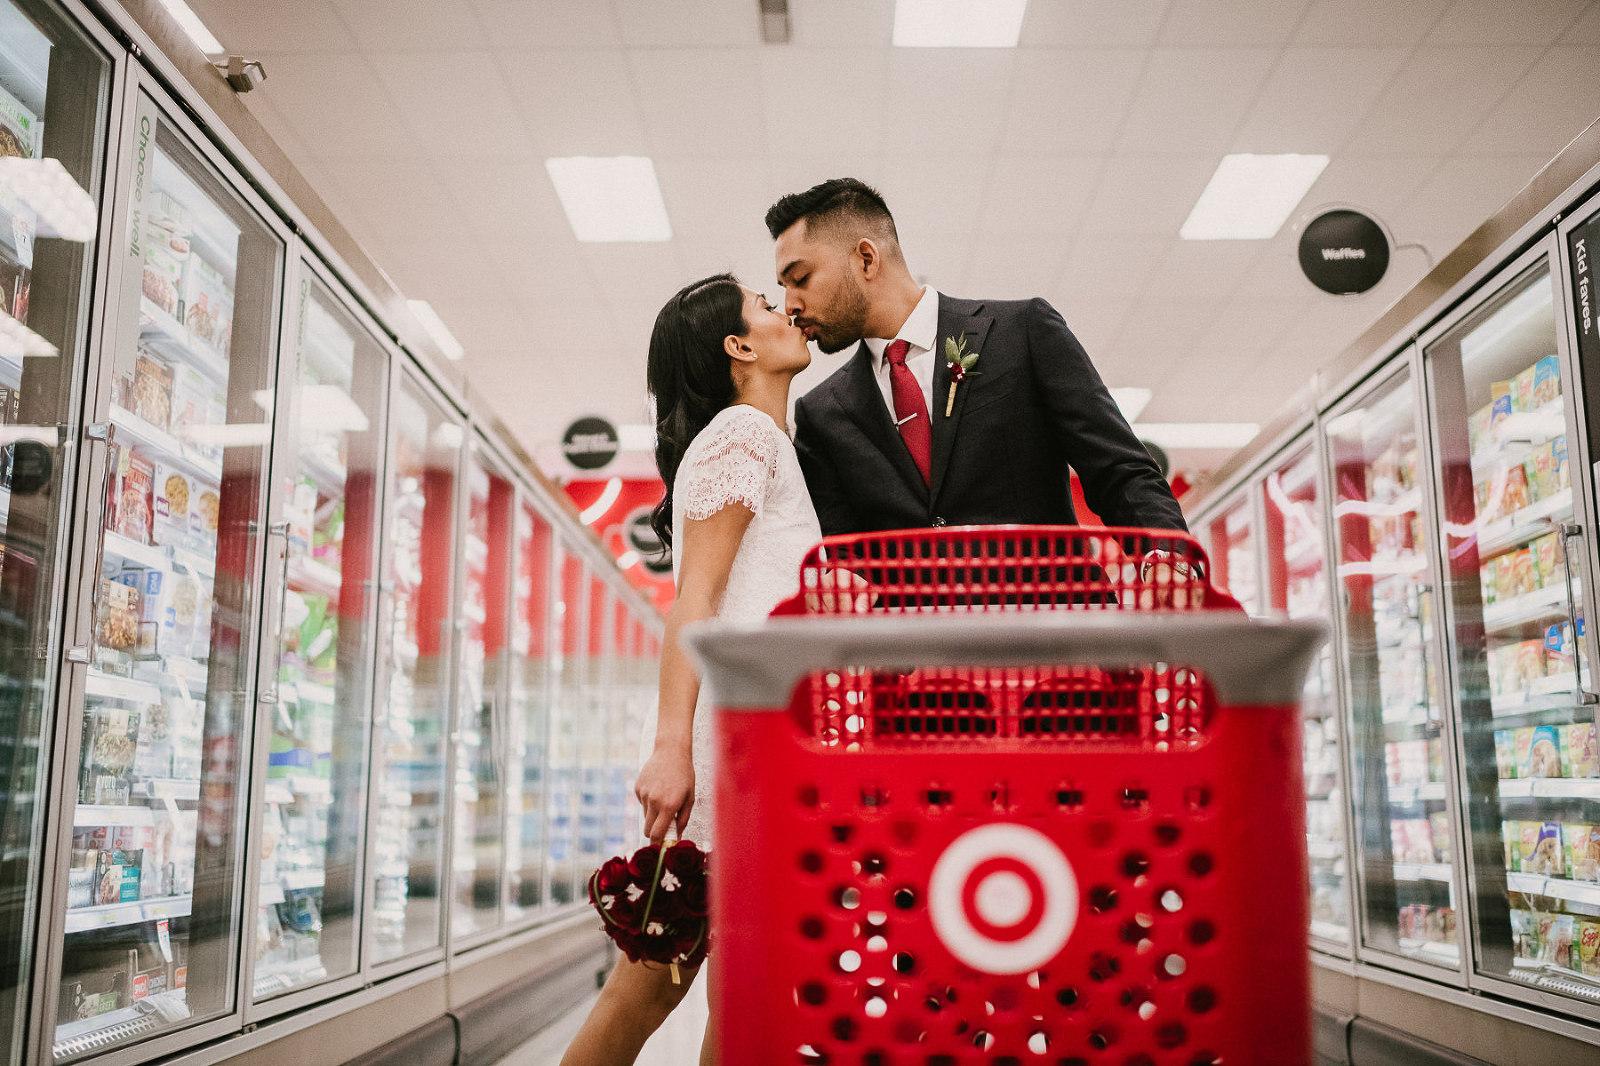 Couple\'s Target Engagement Photos Go Viral: It\'s a \